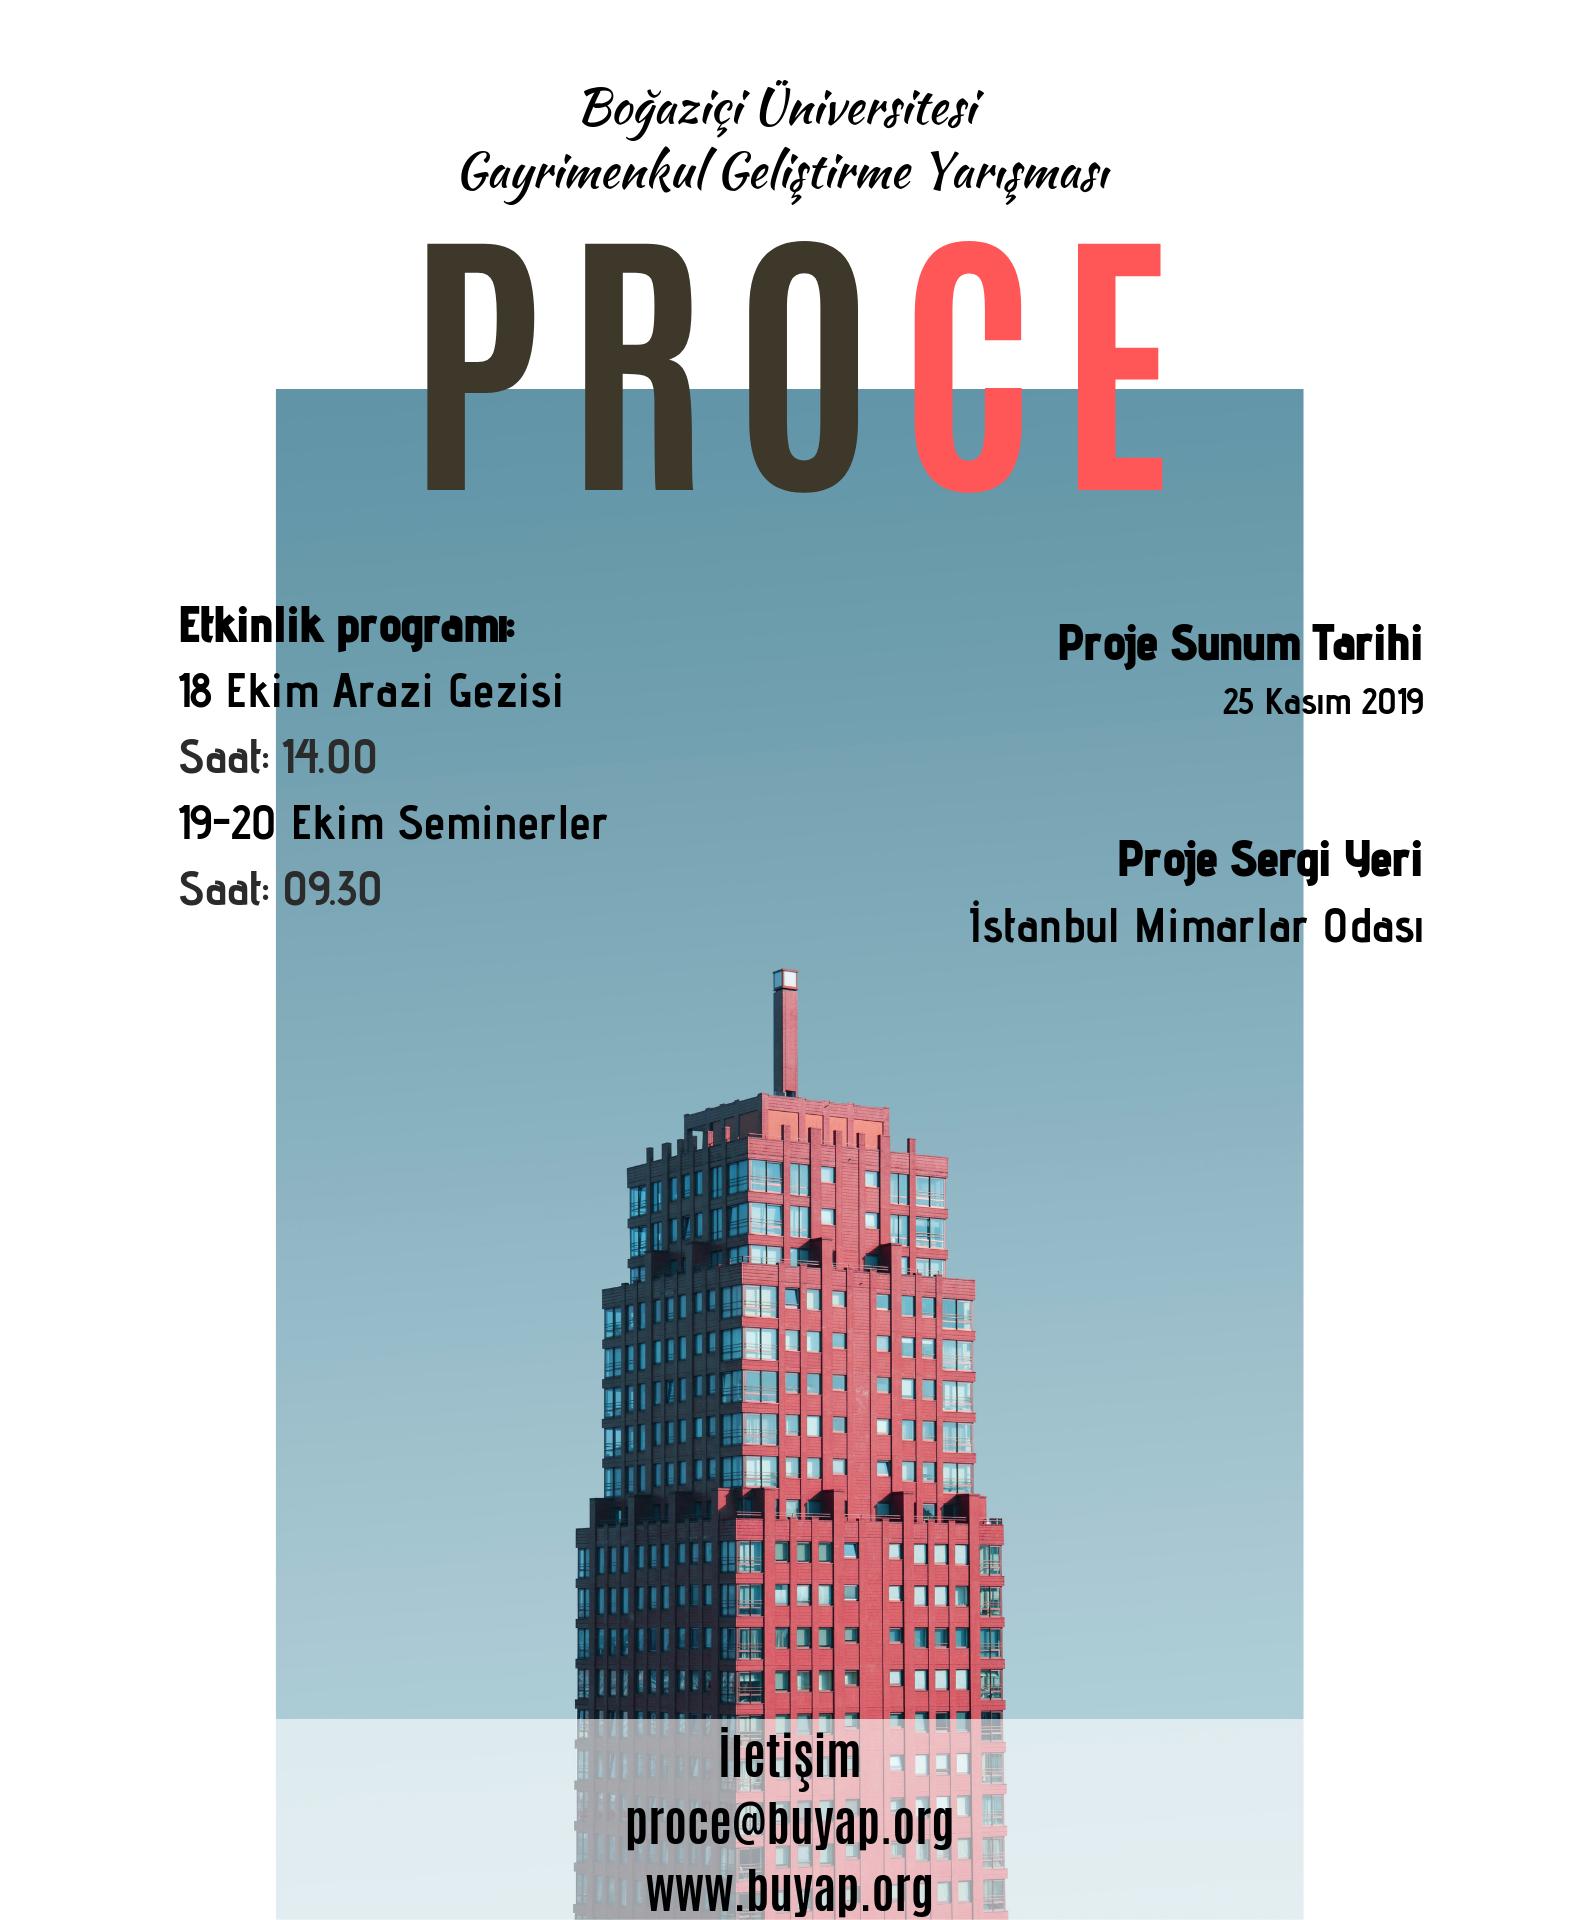 proje afiş